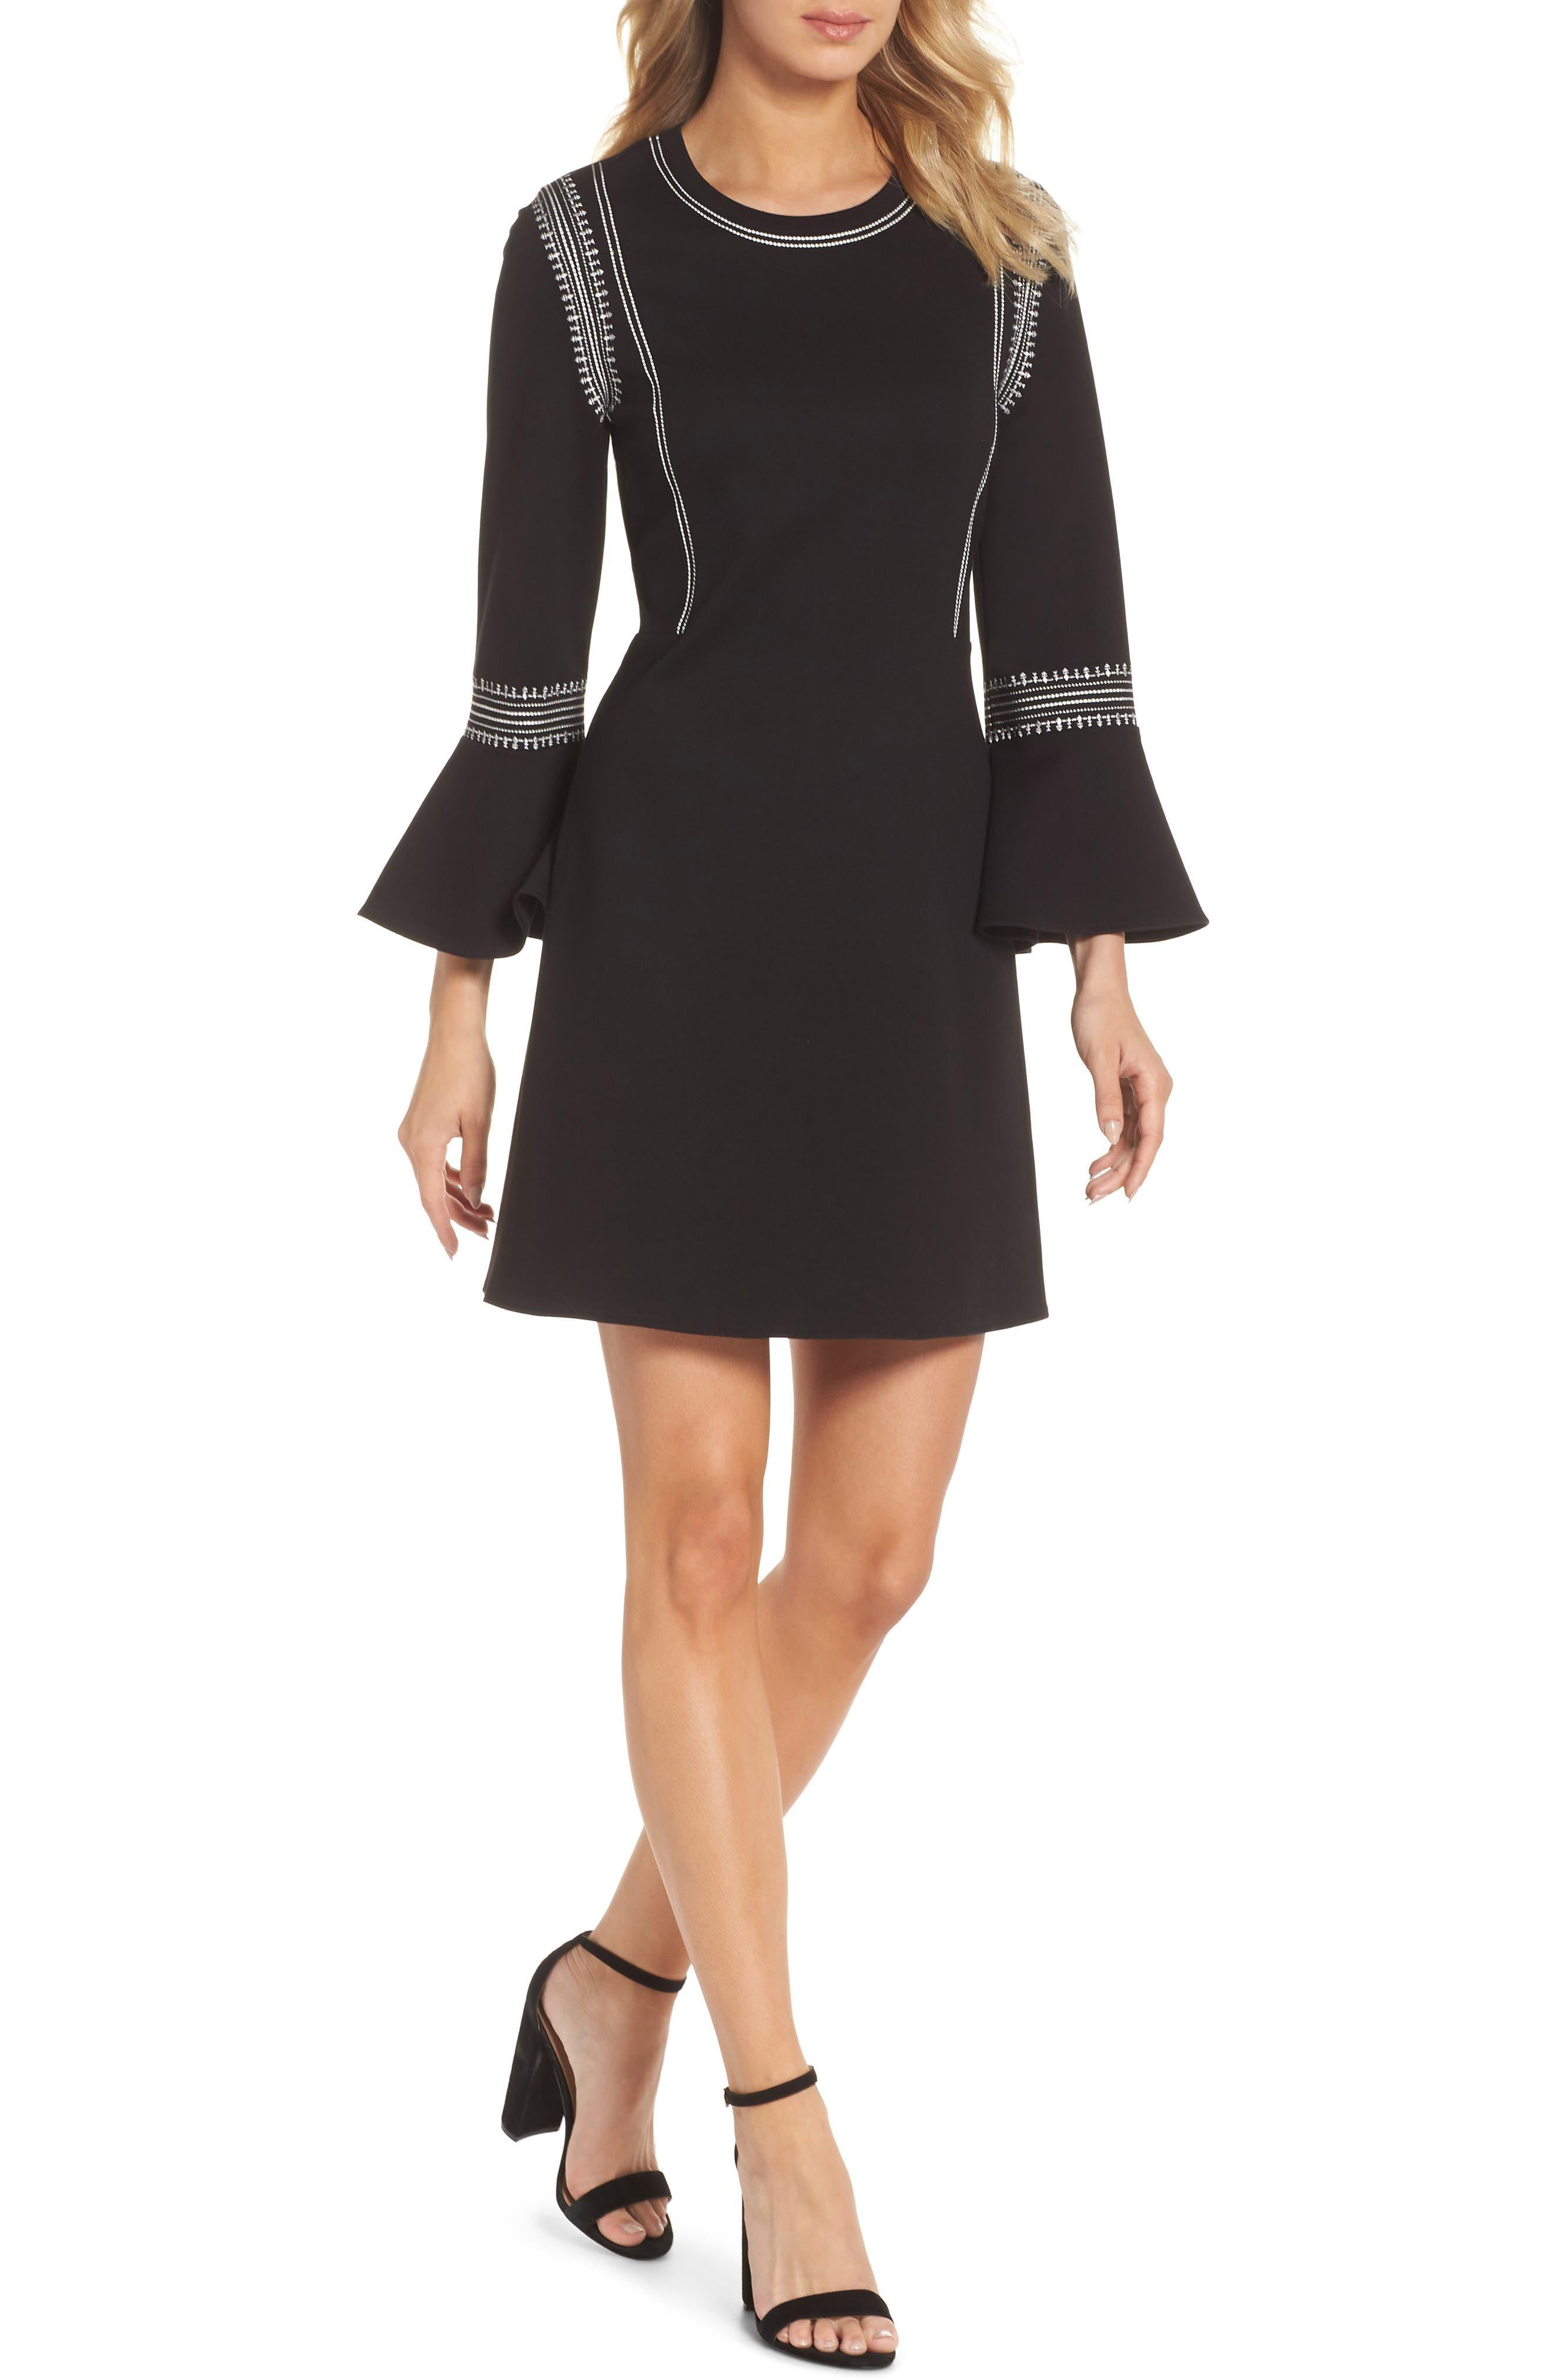 Kobi Halperin Danielle Embroidered Bell Sleeve Knit Dress